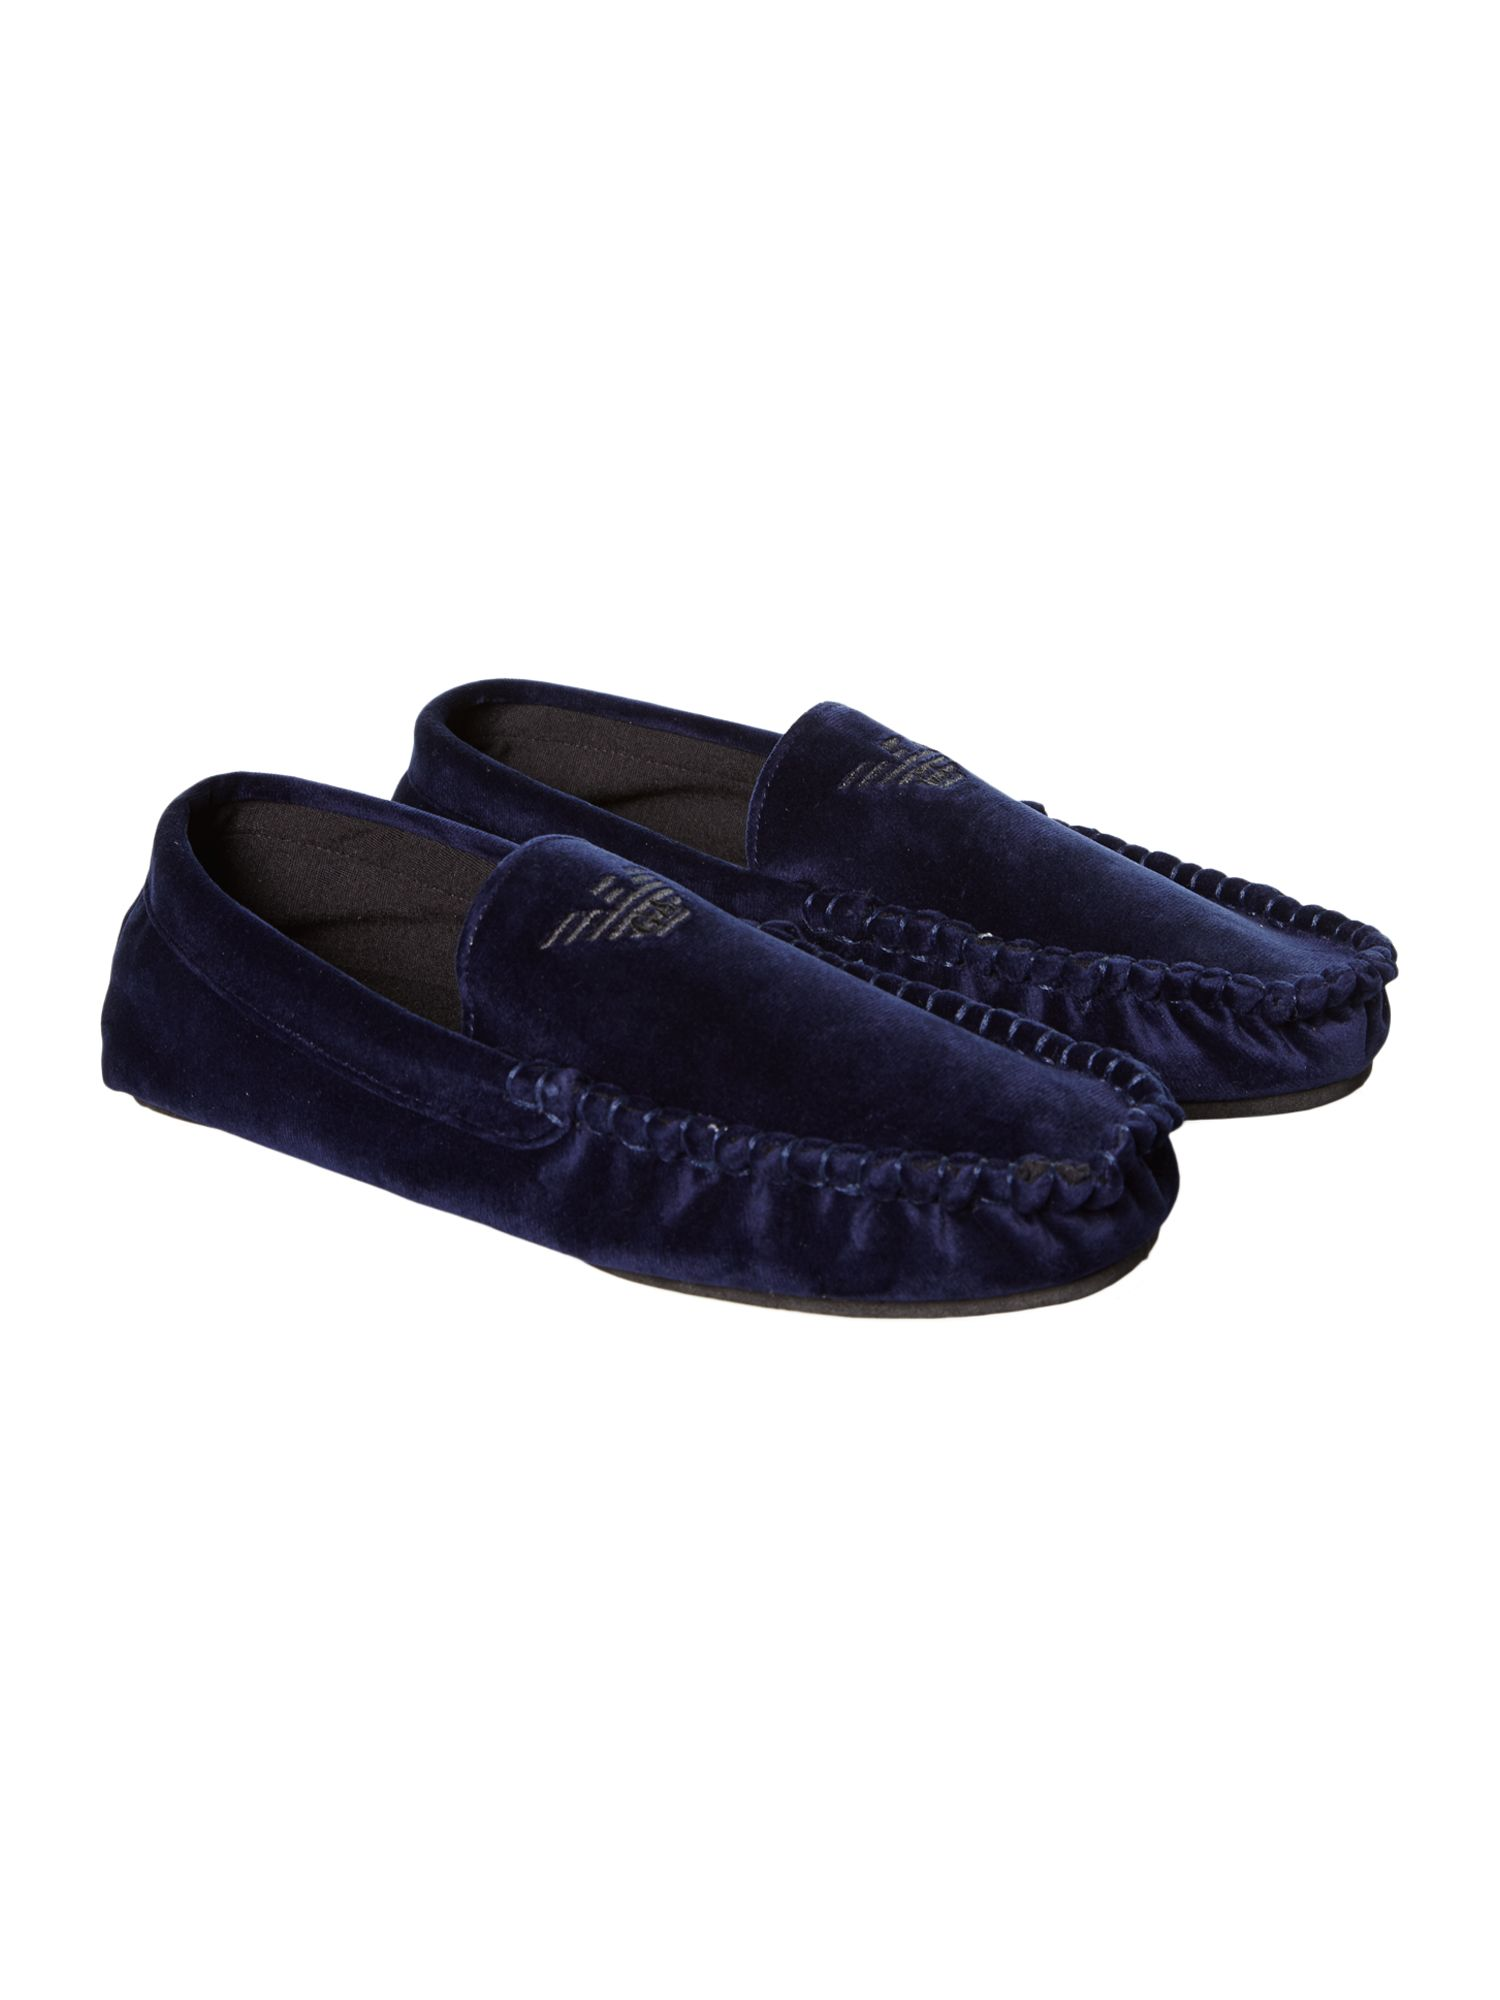 Armani Jeans Logo Shoe Slippers In Blue For Men Navy Lyst